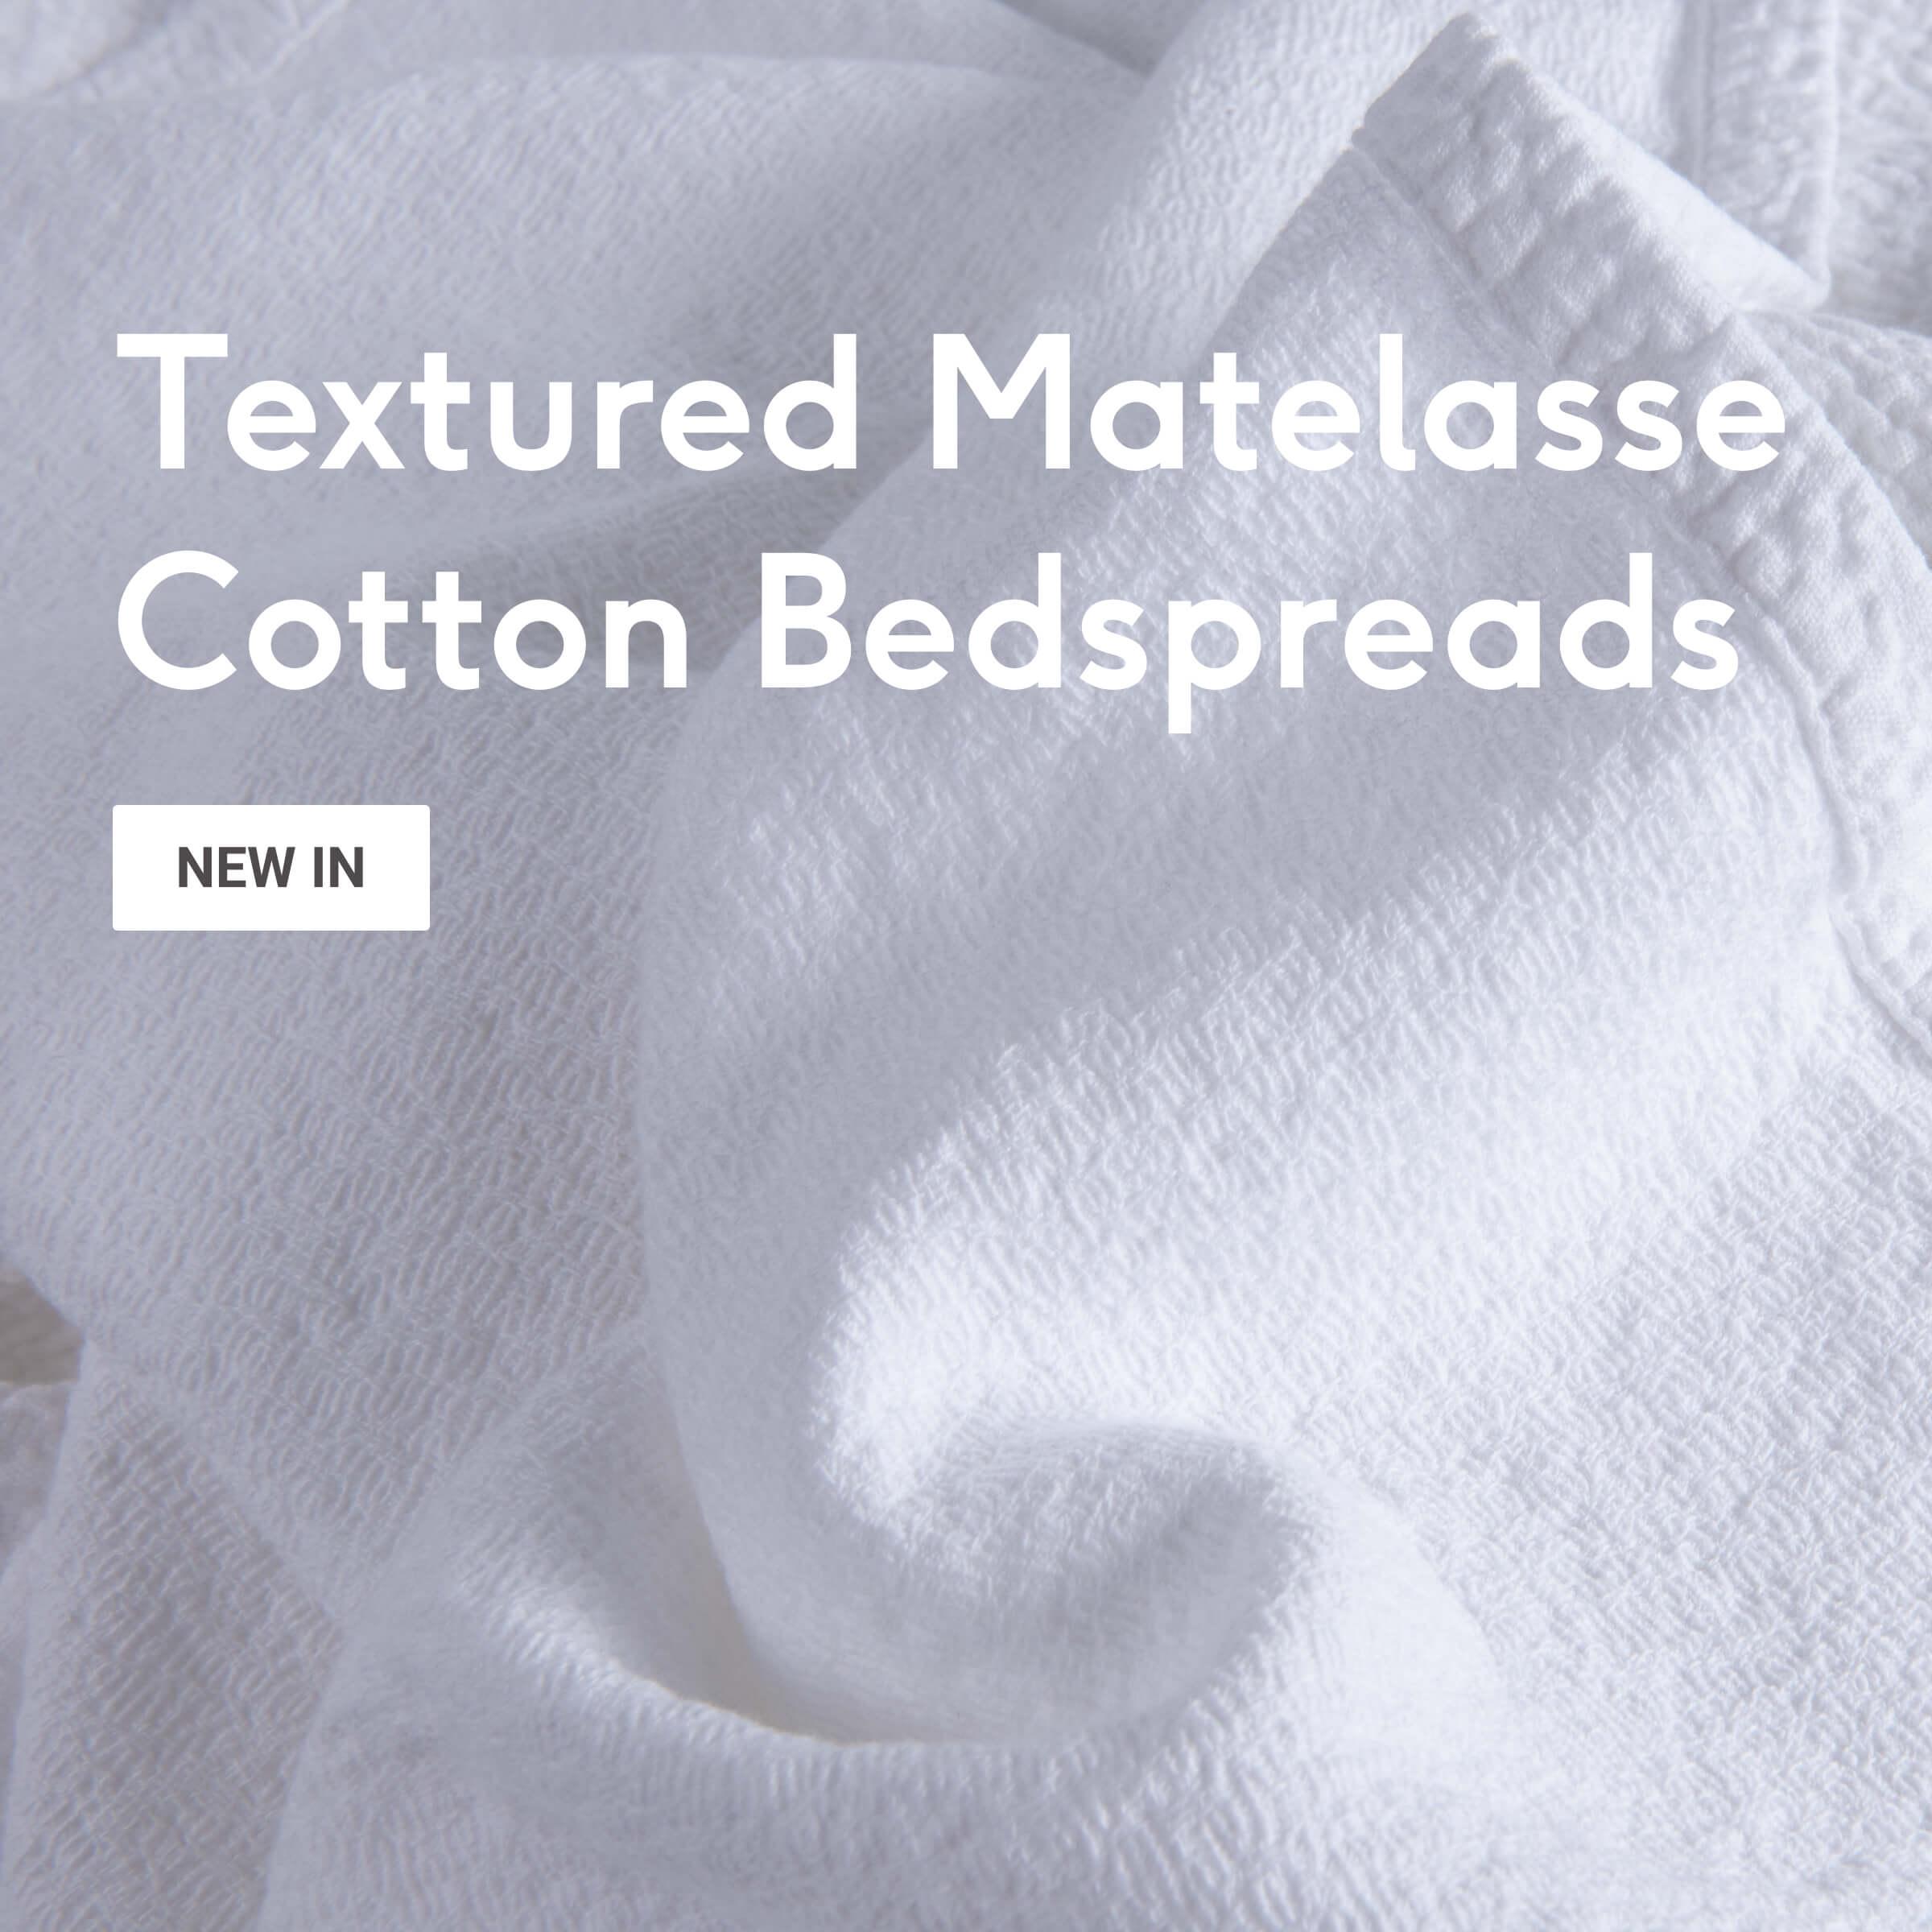 Textured Matelasse Cotton Bedspreads